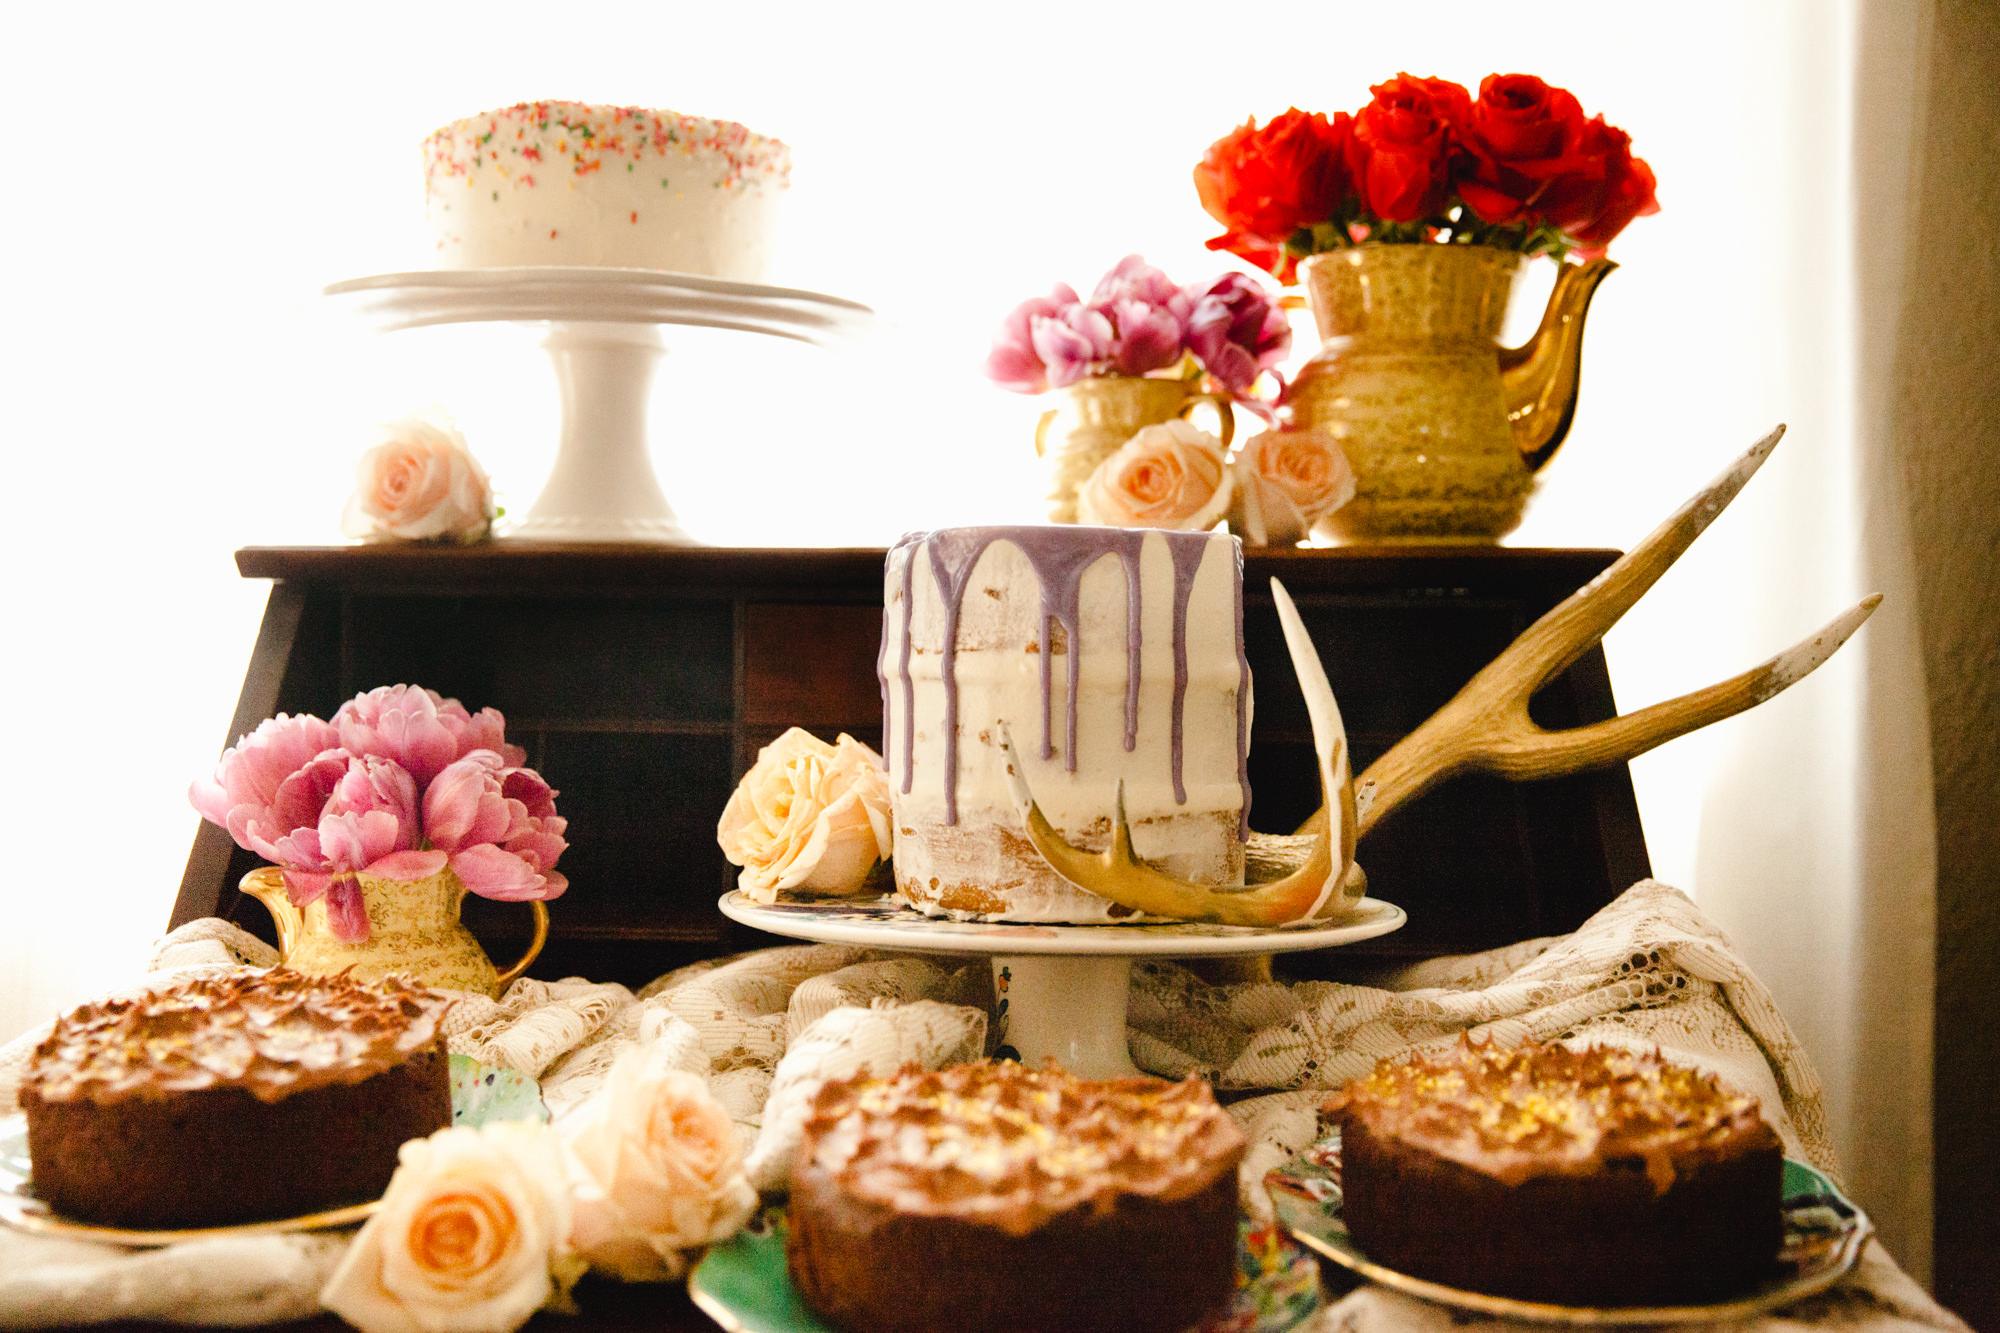 cake-recipe-denver-16.jpg